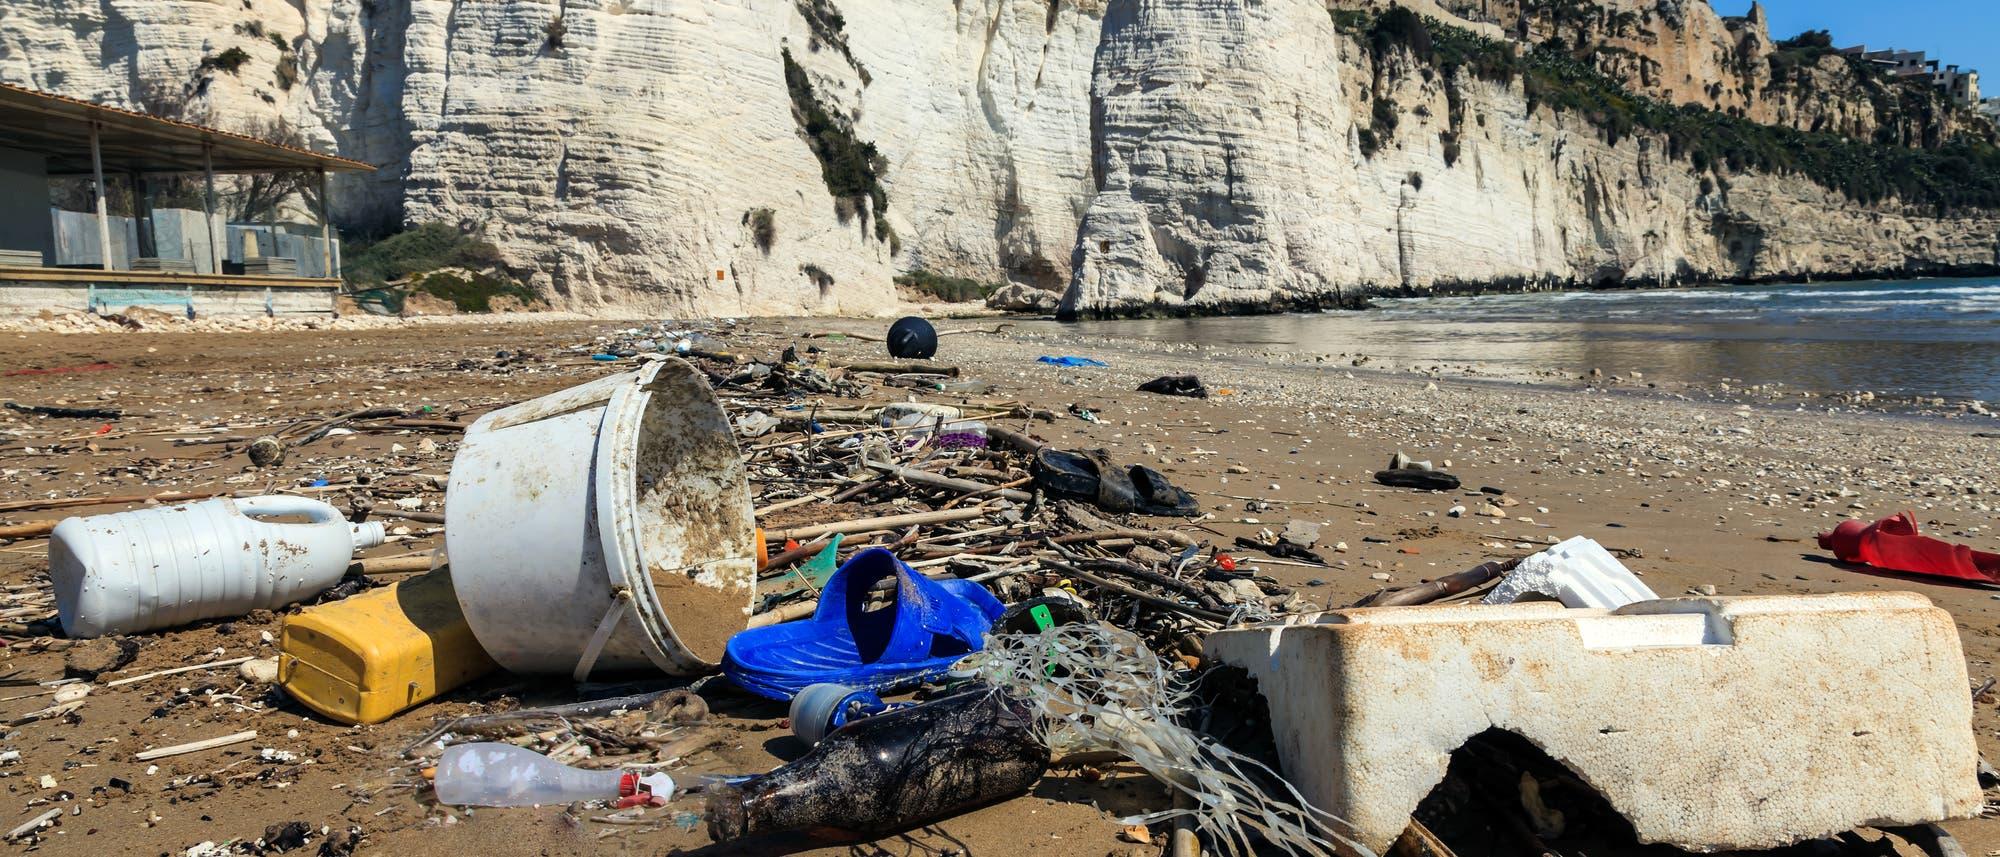 Plastikabfälle an einem Mittelmeerstrand